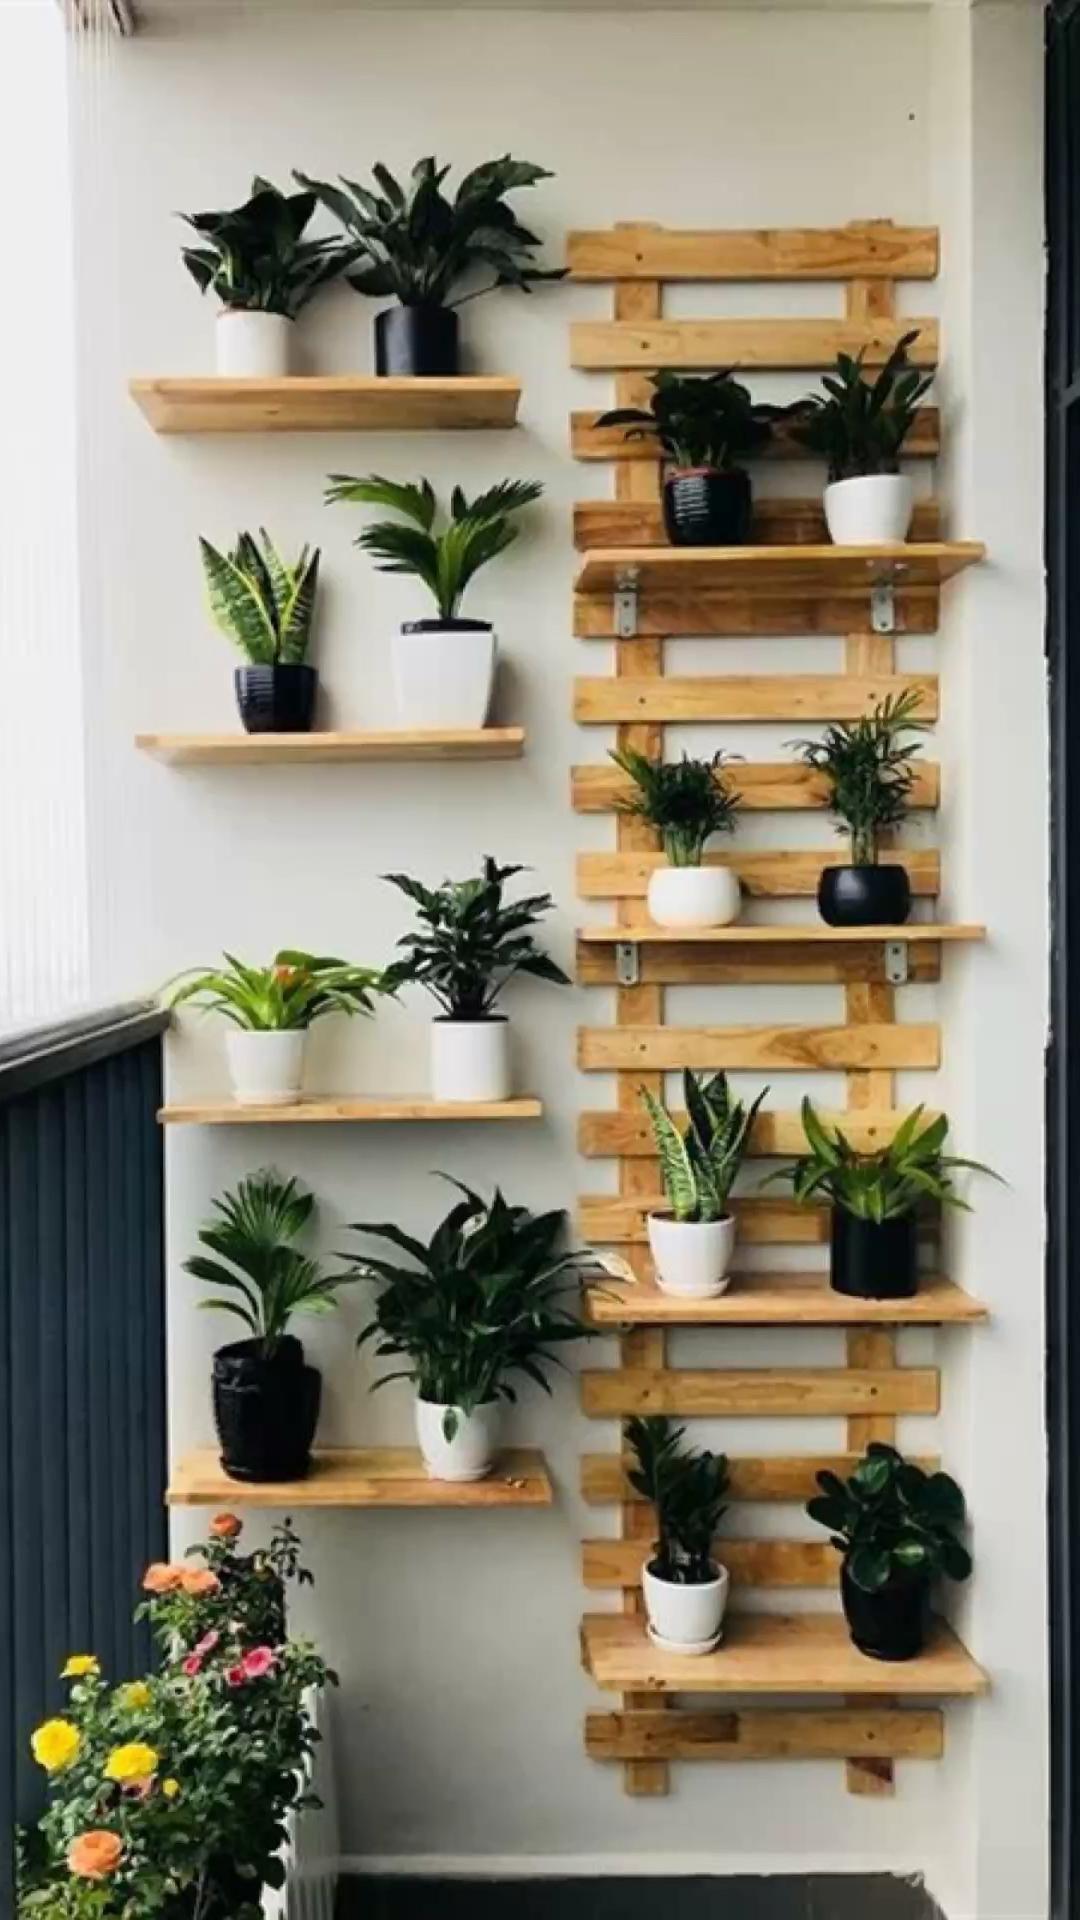 DIY Indoor-Kräutergarten: Schritt für Schritt Anleitung